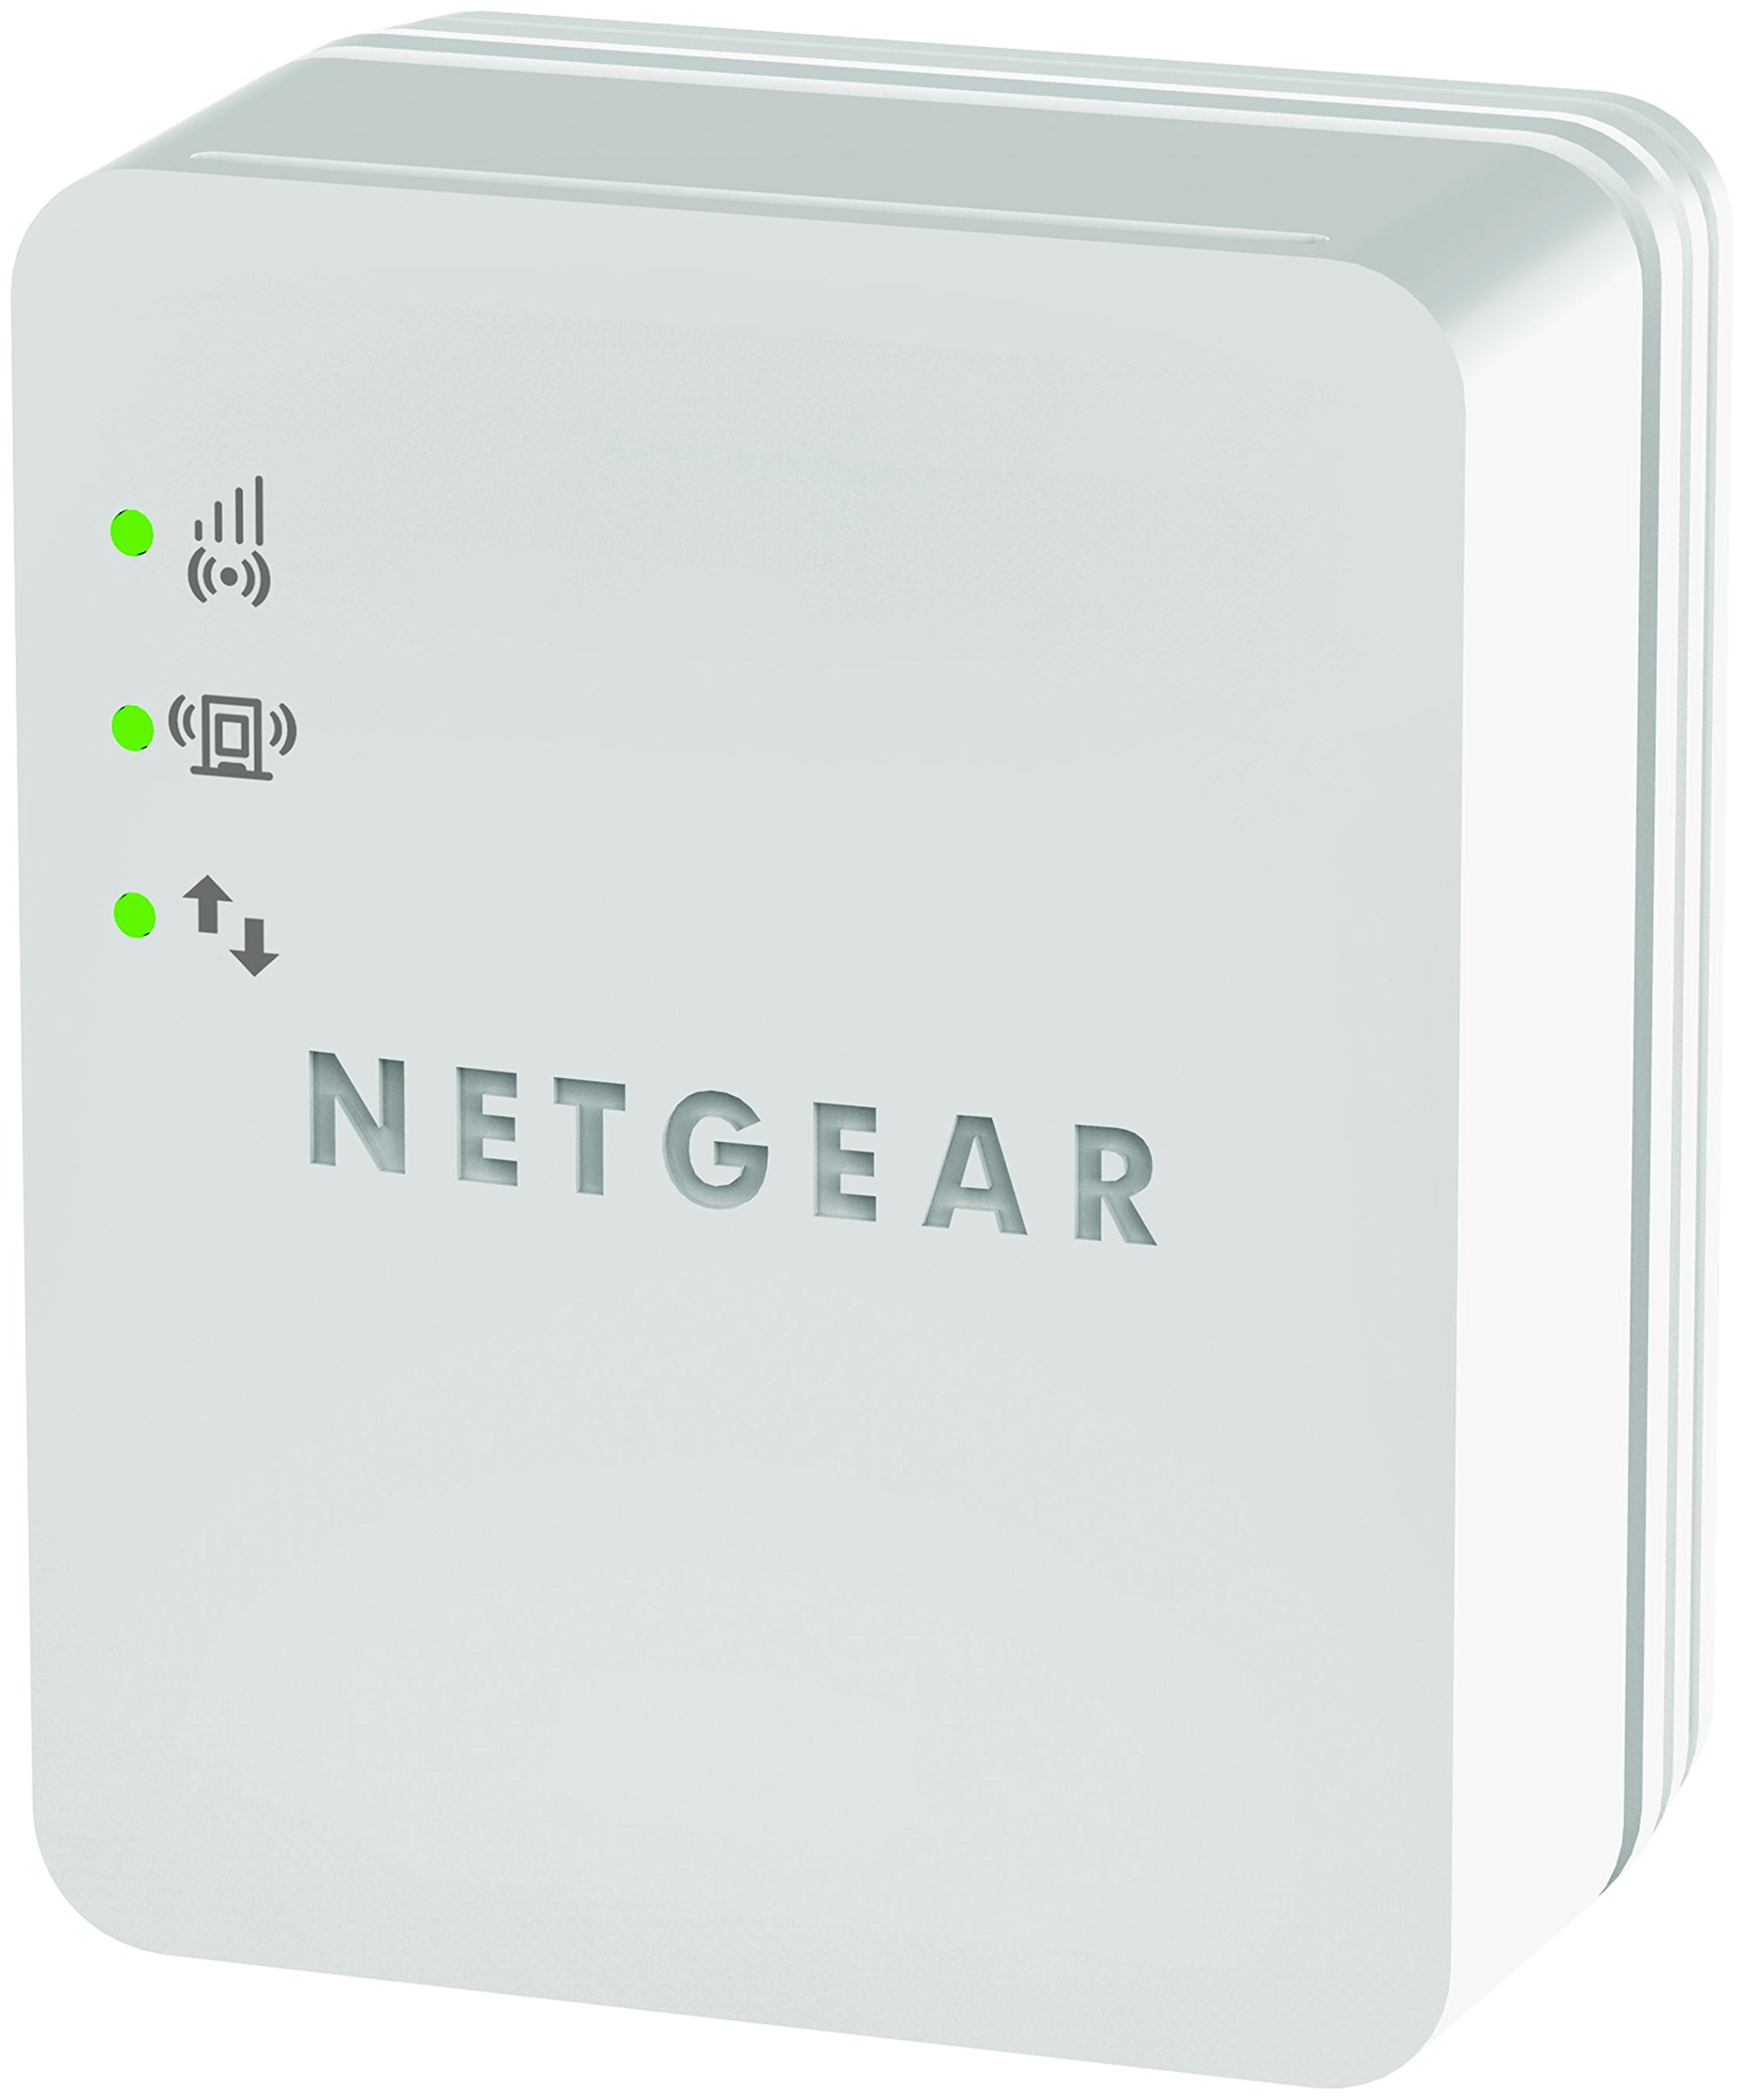 NETGEAR N150 Wi-Fi Range Extender for Mobile - Wall Plug Version (WN1000RP) by NETGEAR (Image #2)